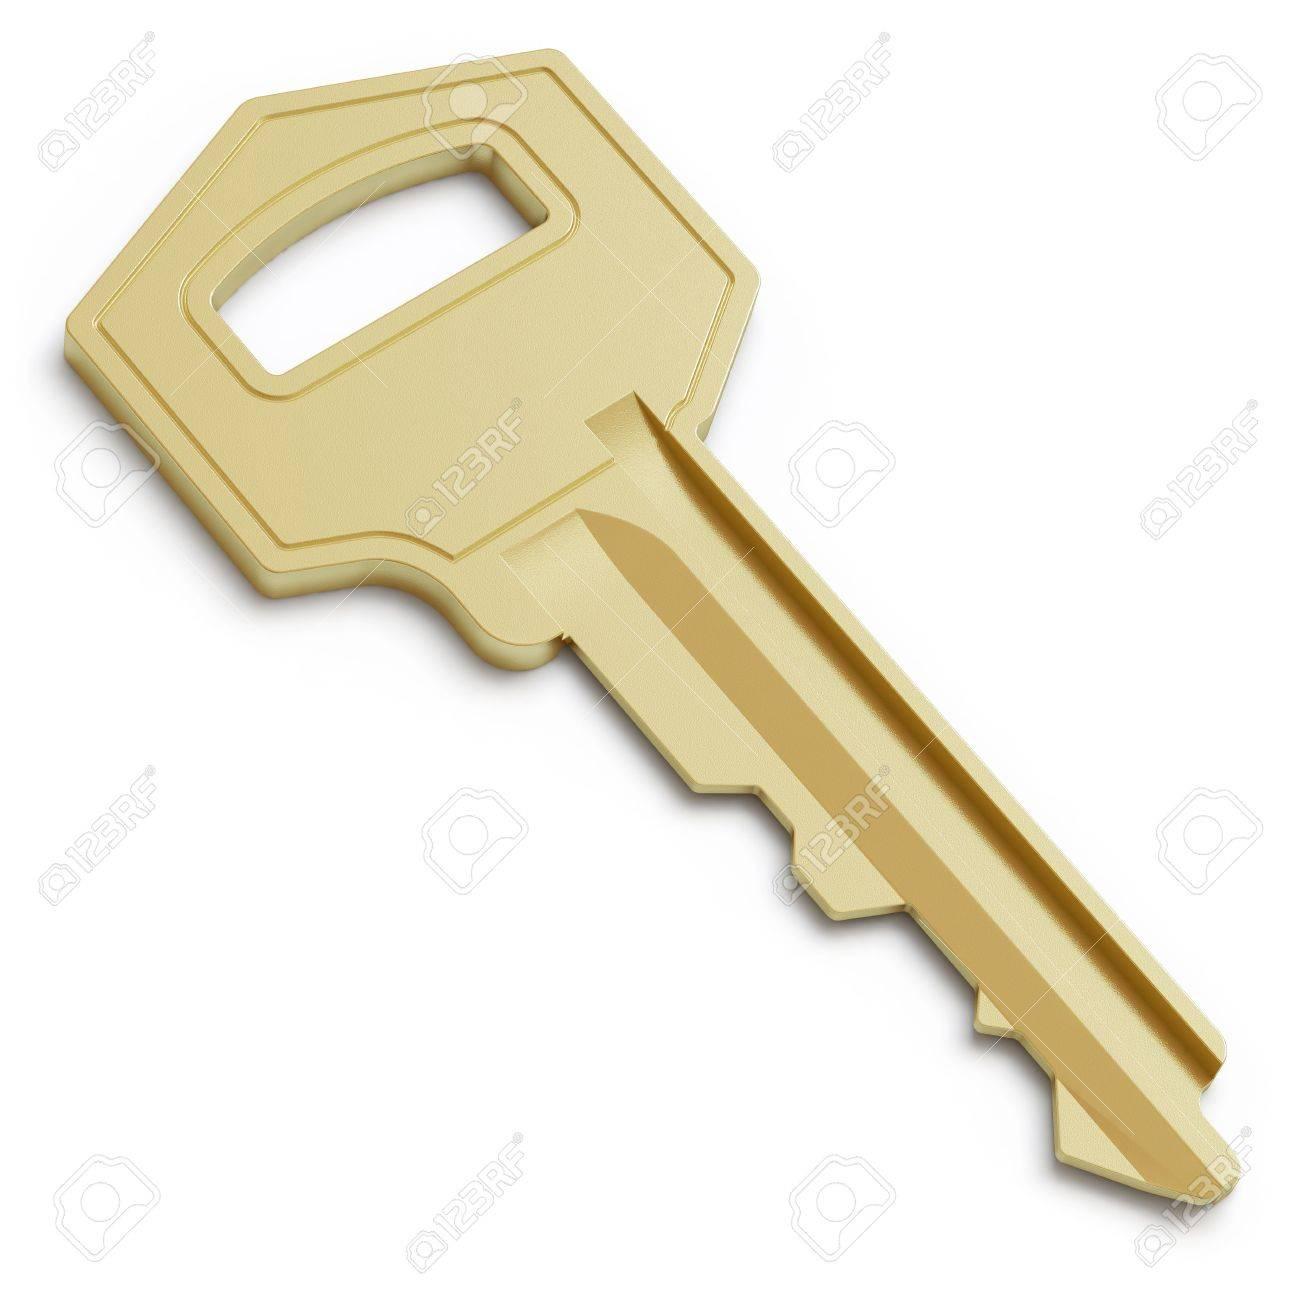 key Stock Photo - 6699499